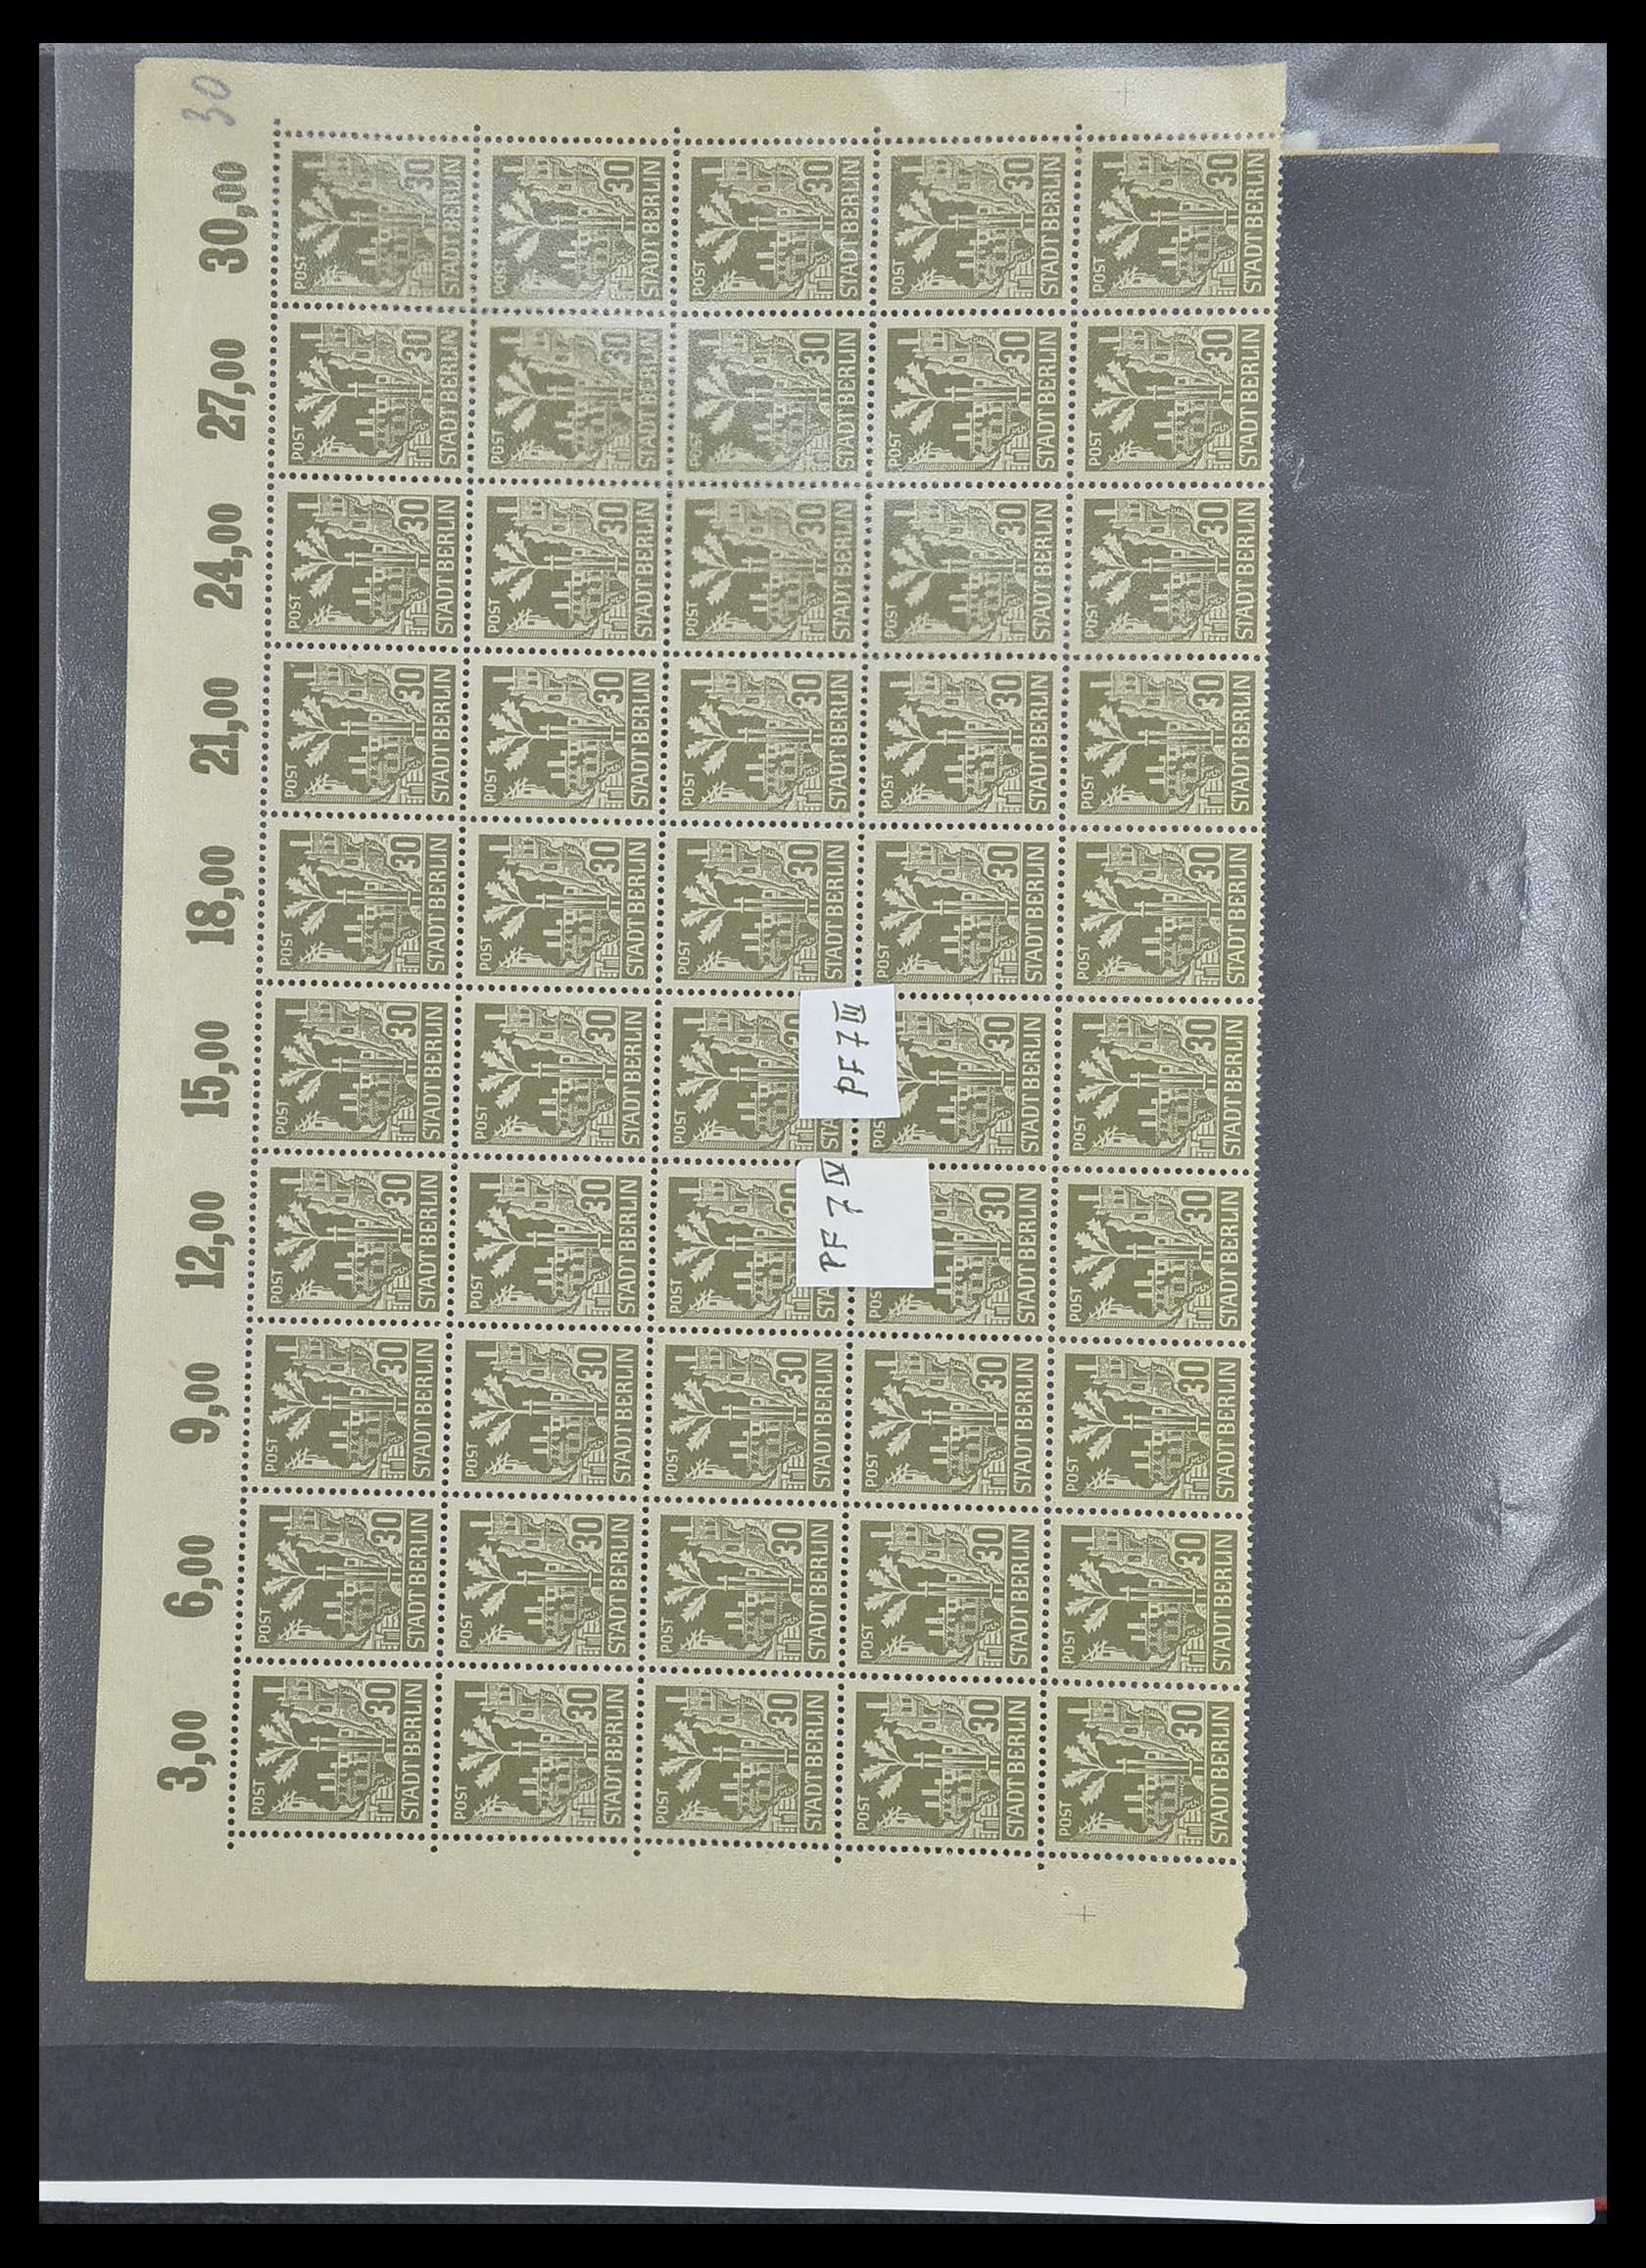 33698 010 - Postzegelverzameling 33698 Sovjet Zone 1945-1948.